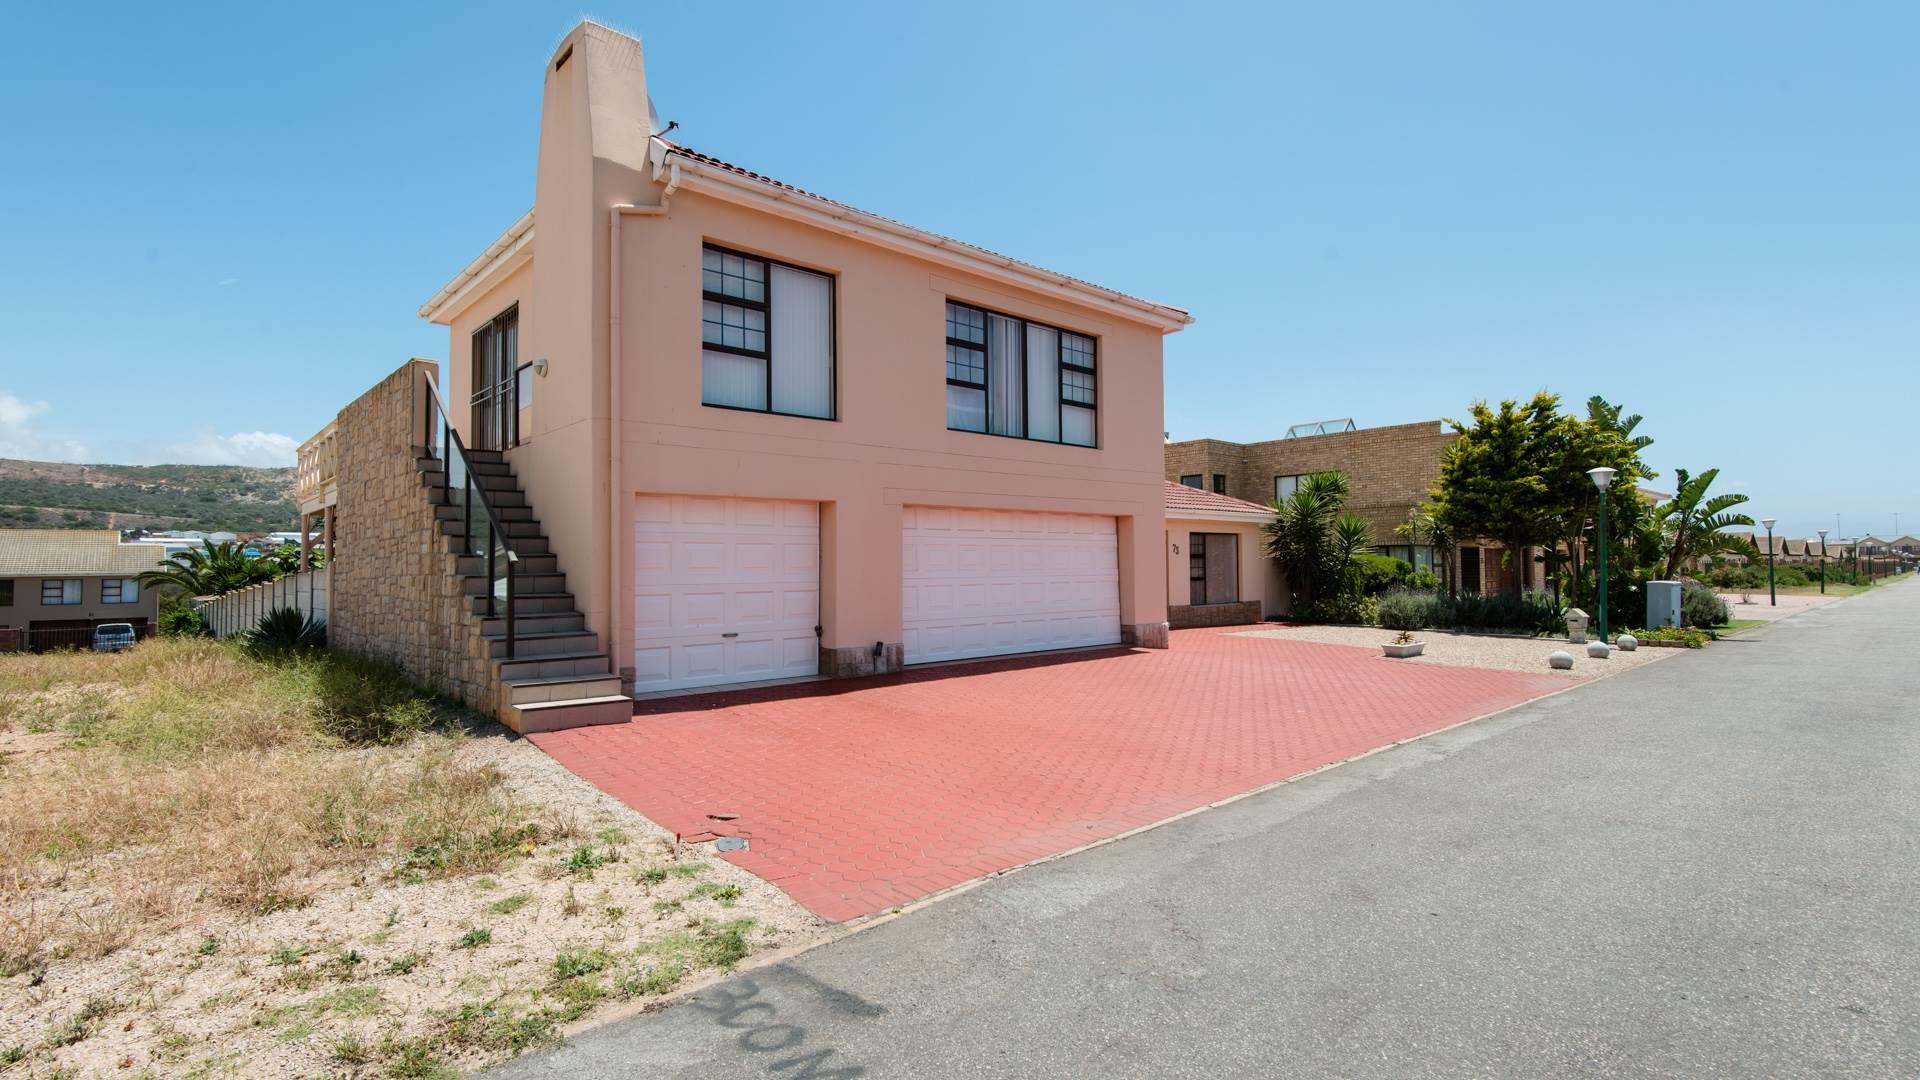 3 BedroomHouse For Sale In Diaz Beach